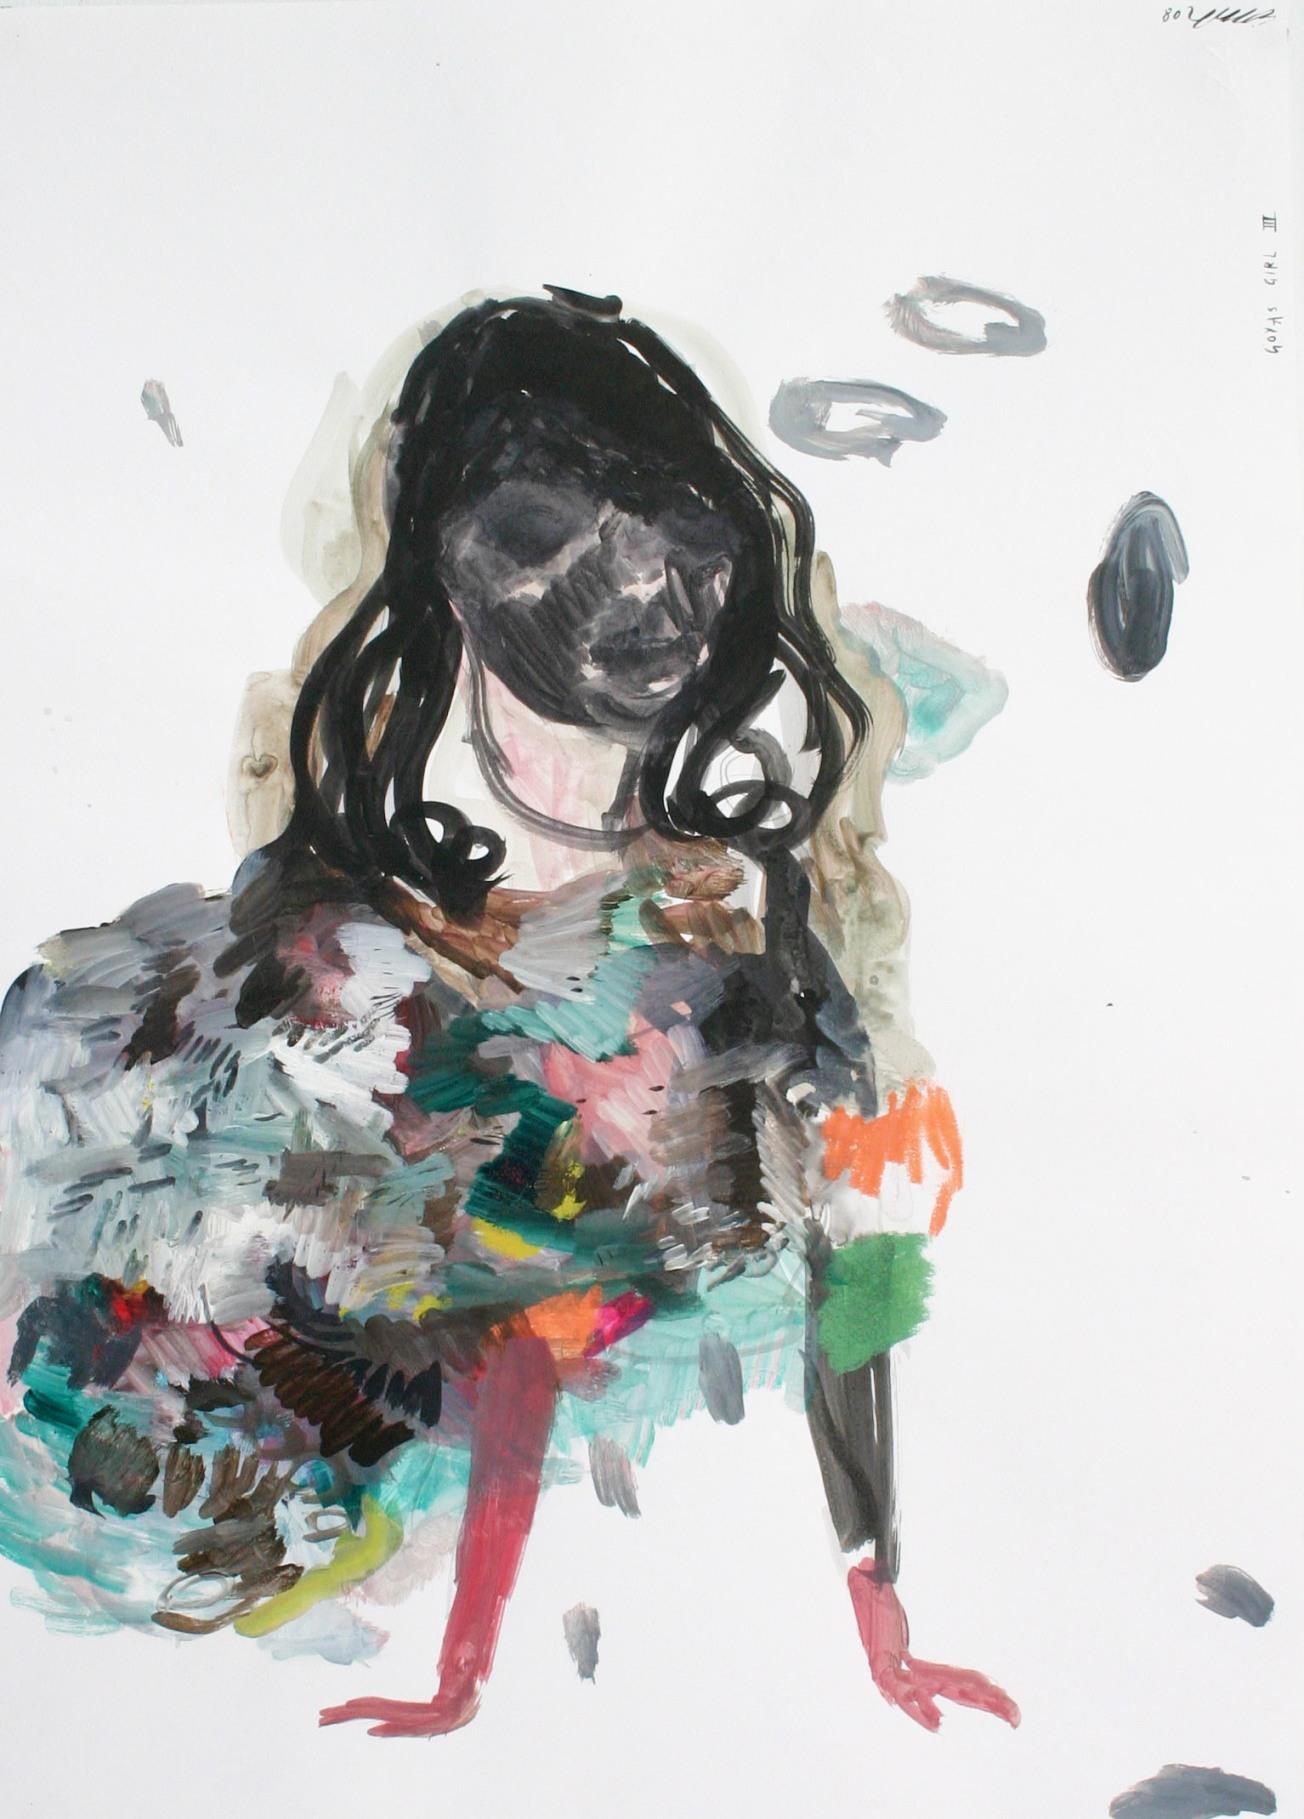 Emma Smith, Goya's girl, Mixed media on paper, 420 x 594 mm. 2009